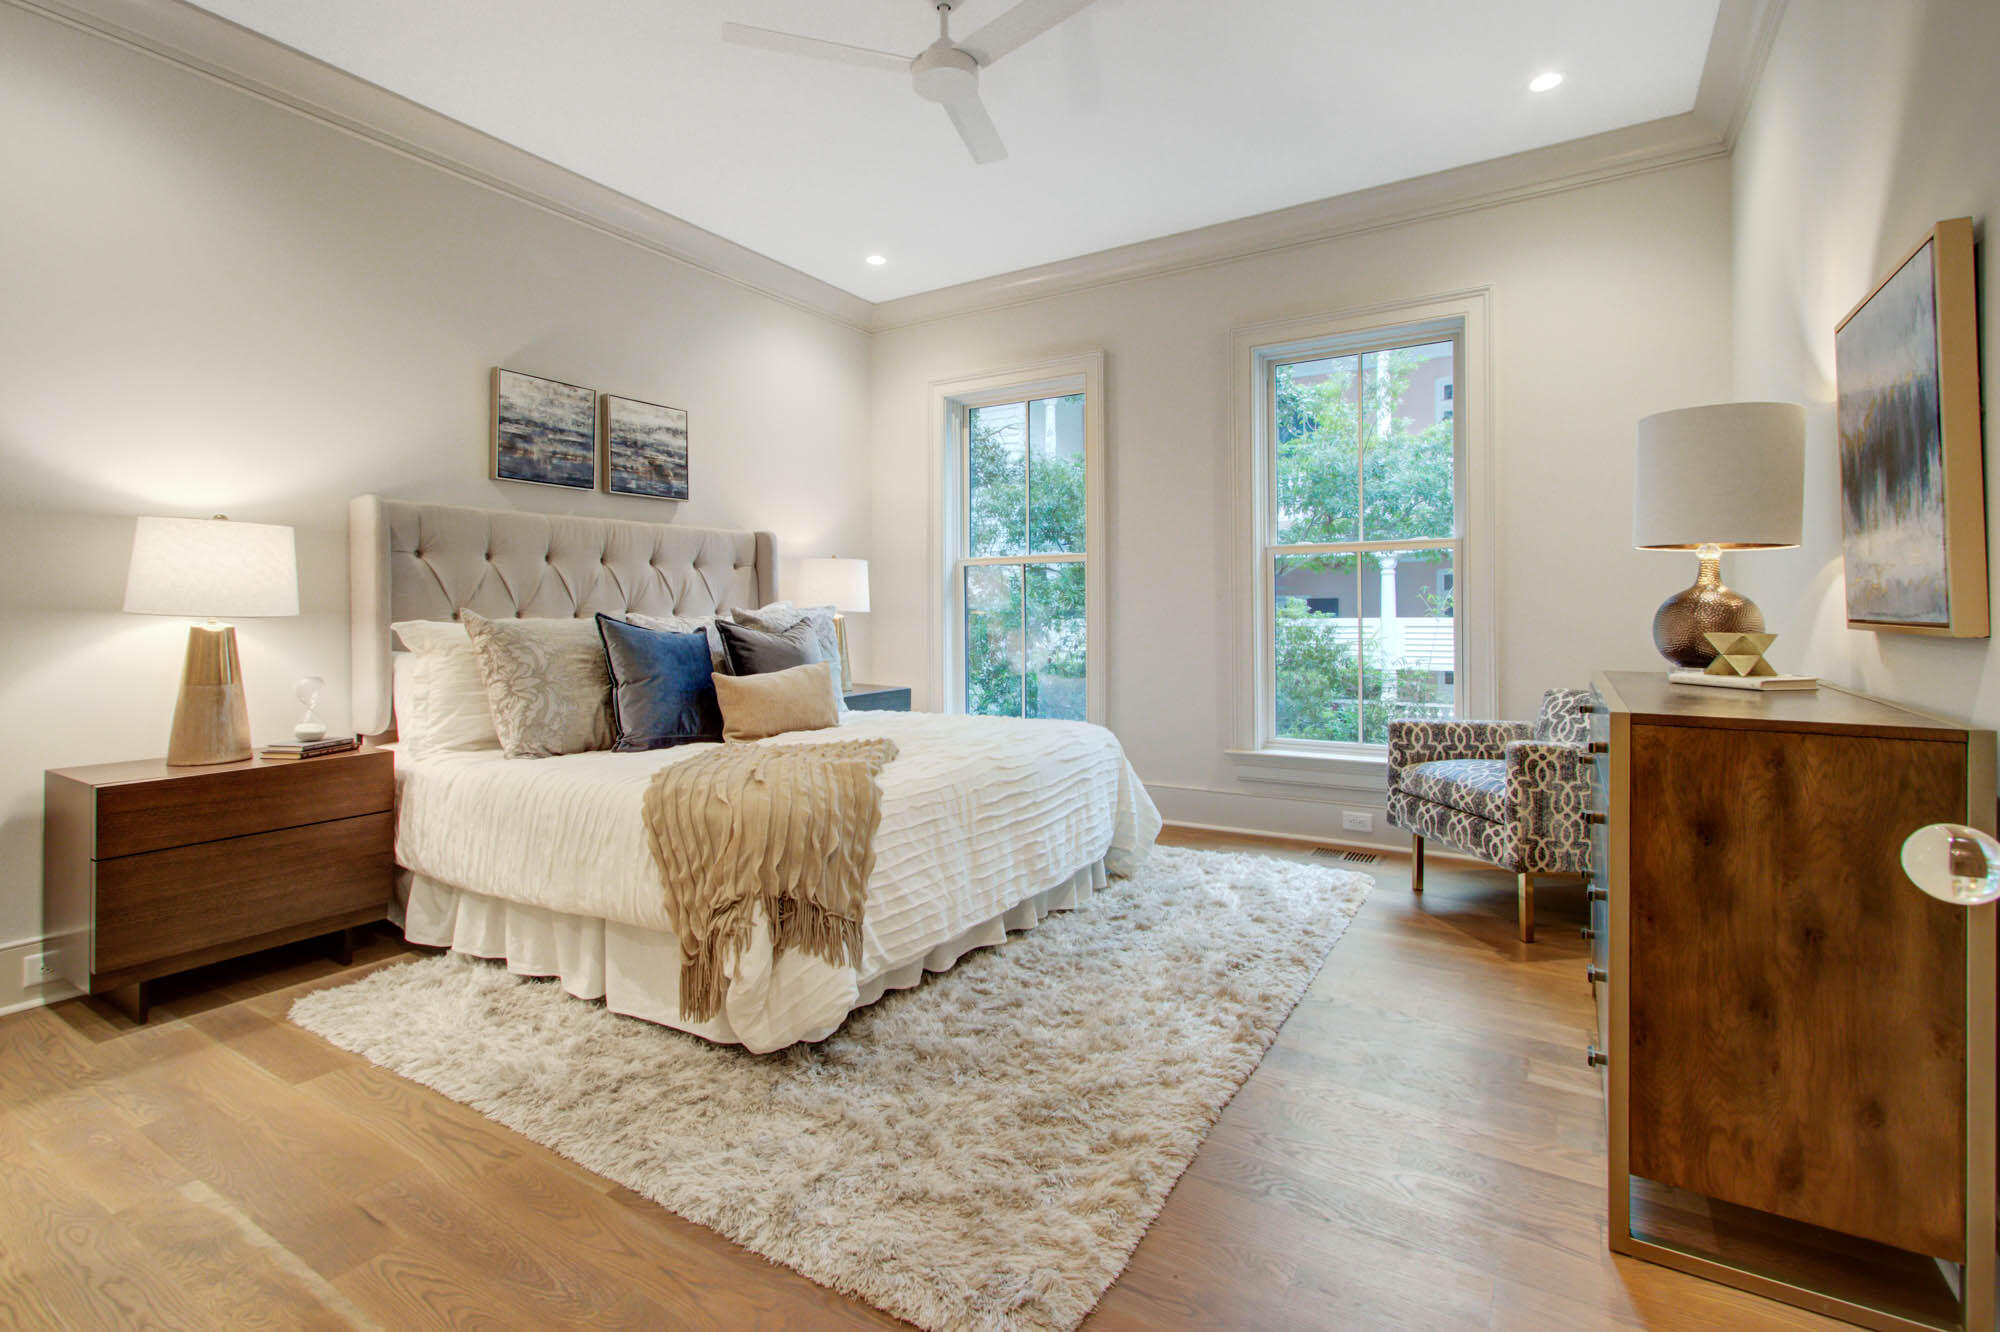 Harleston Village Homes For Sale - 31 Smith, Charleston, SC - 19